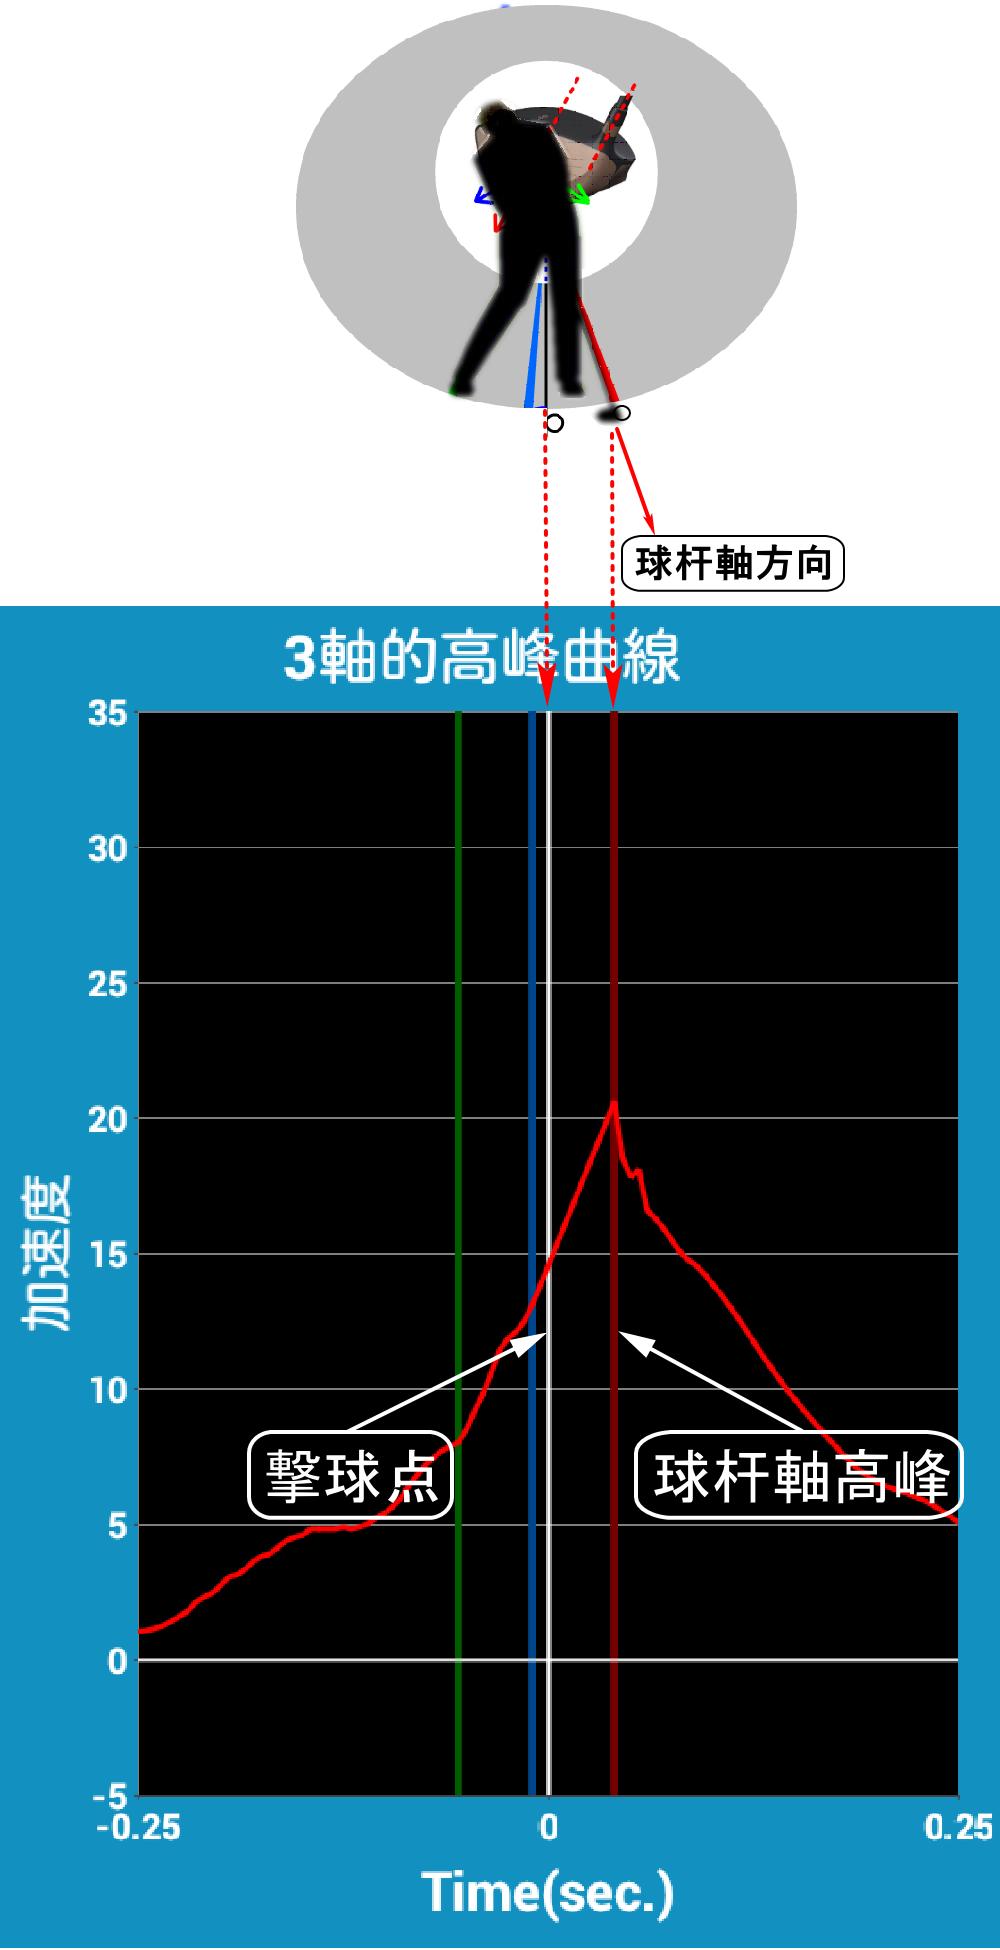 SmartShot的杆轴方向的挥杆速度及高峰点